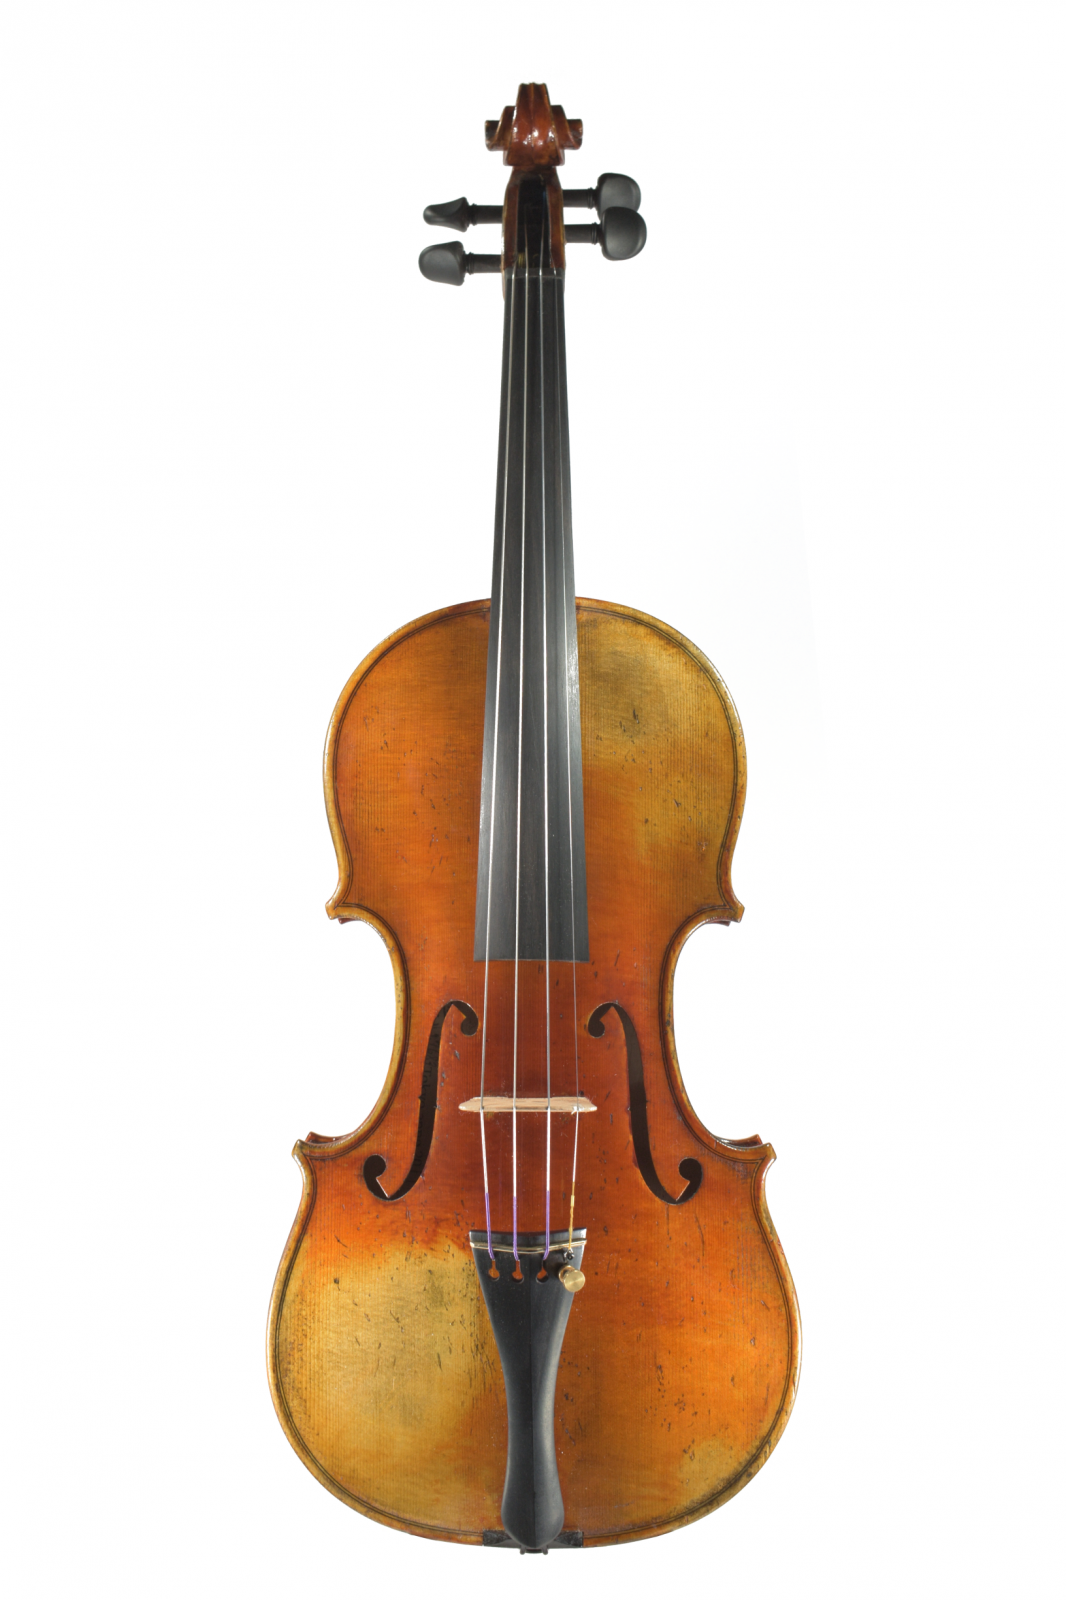 Violin labeled Hiroshi Kono